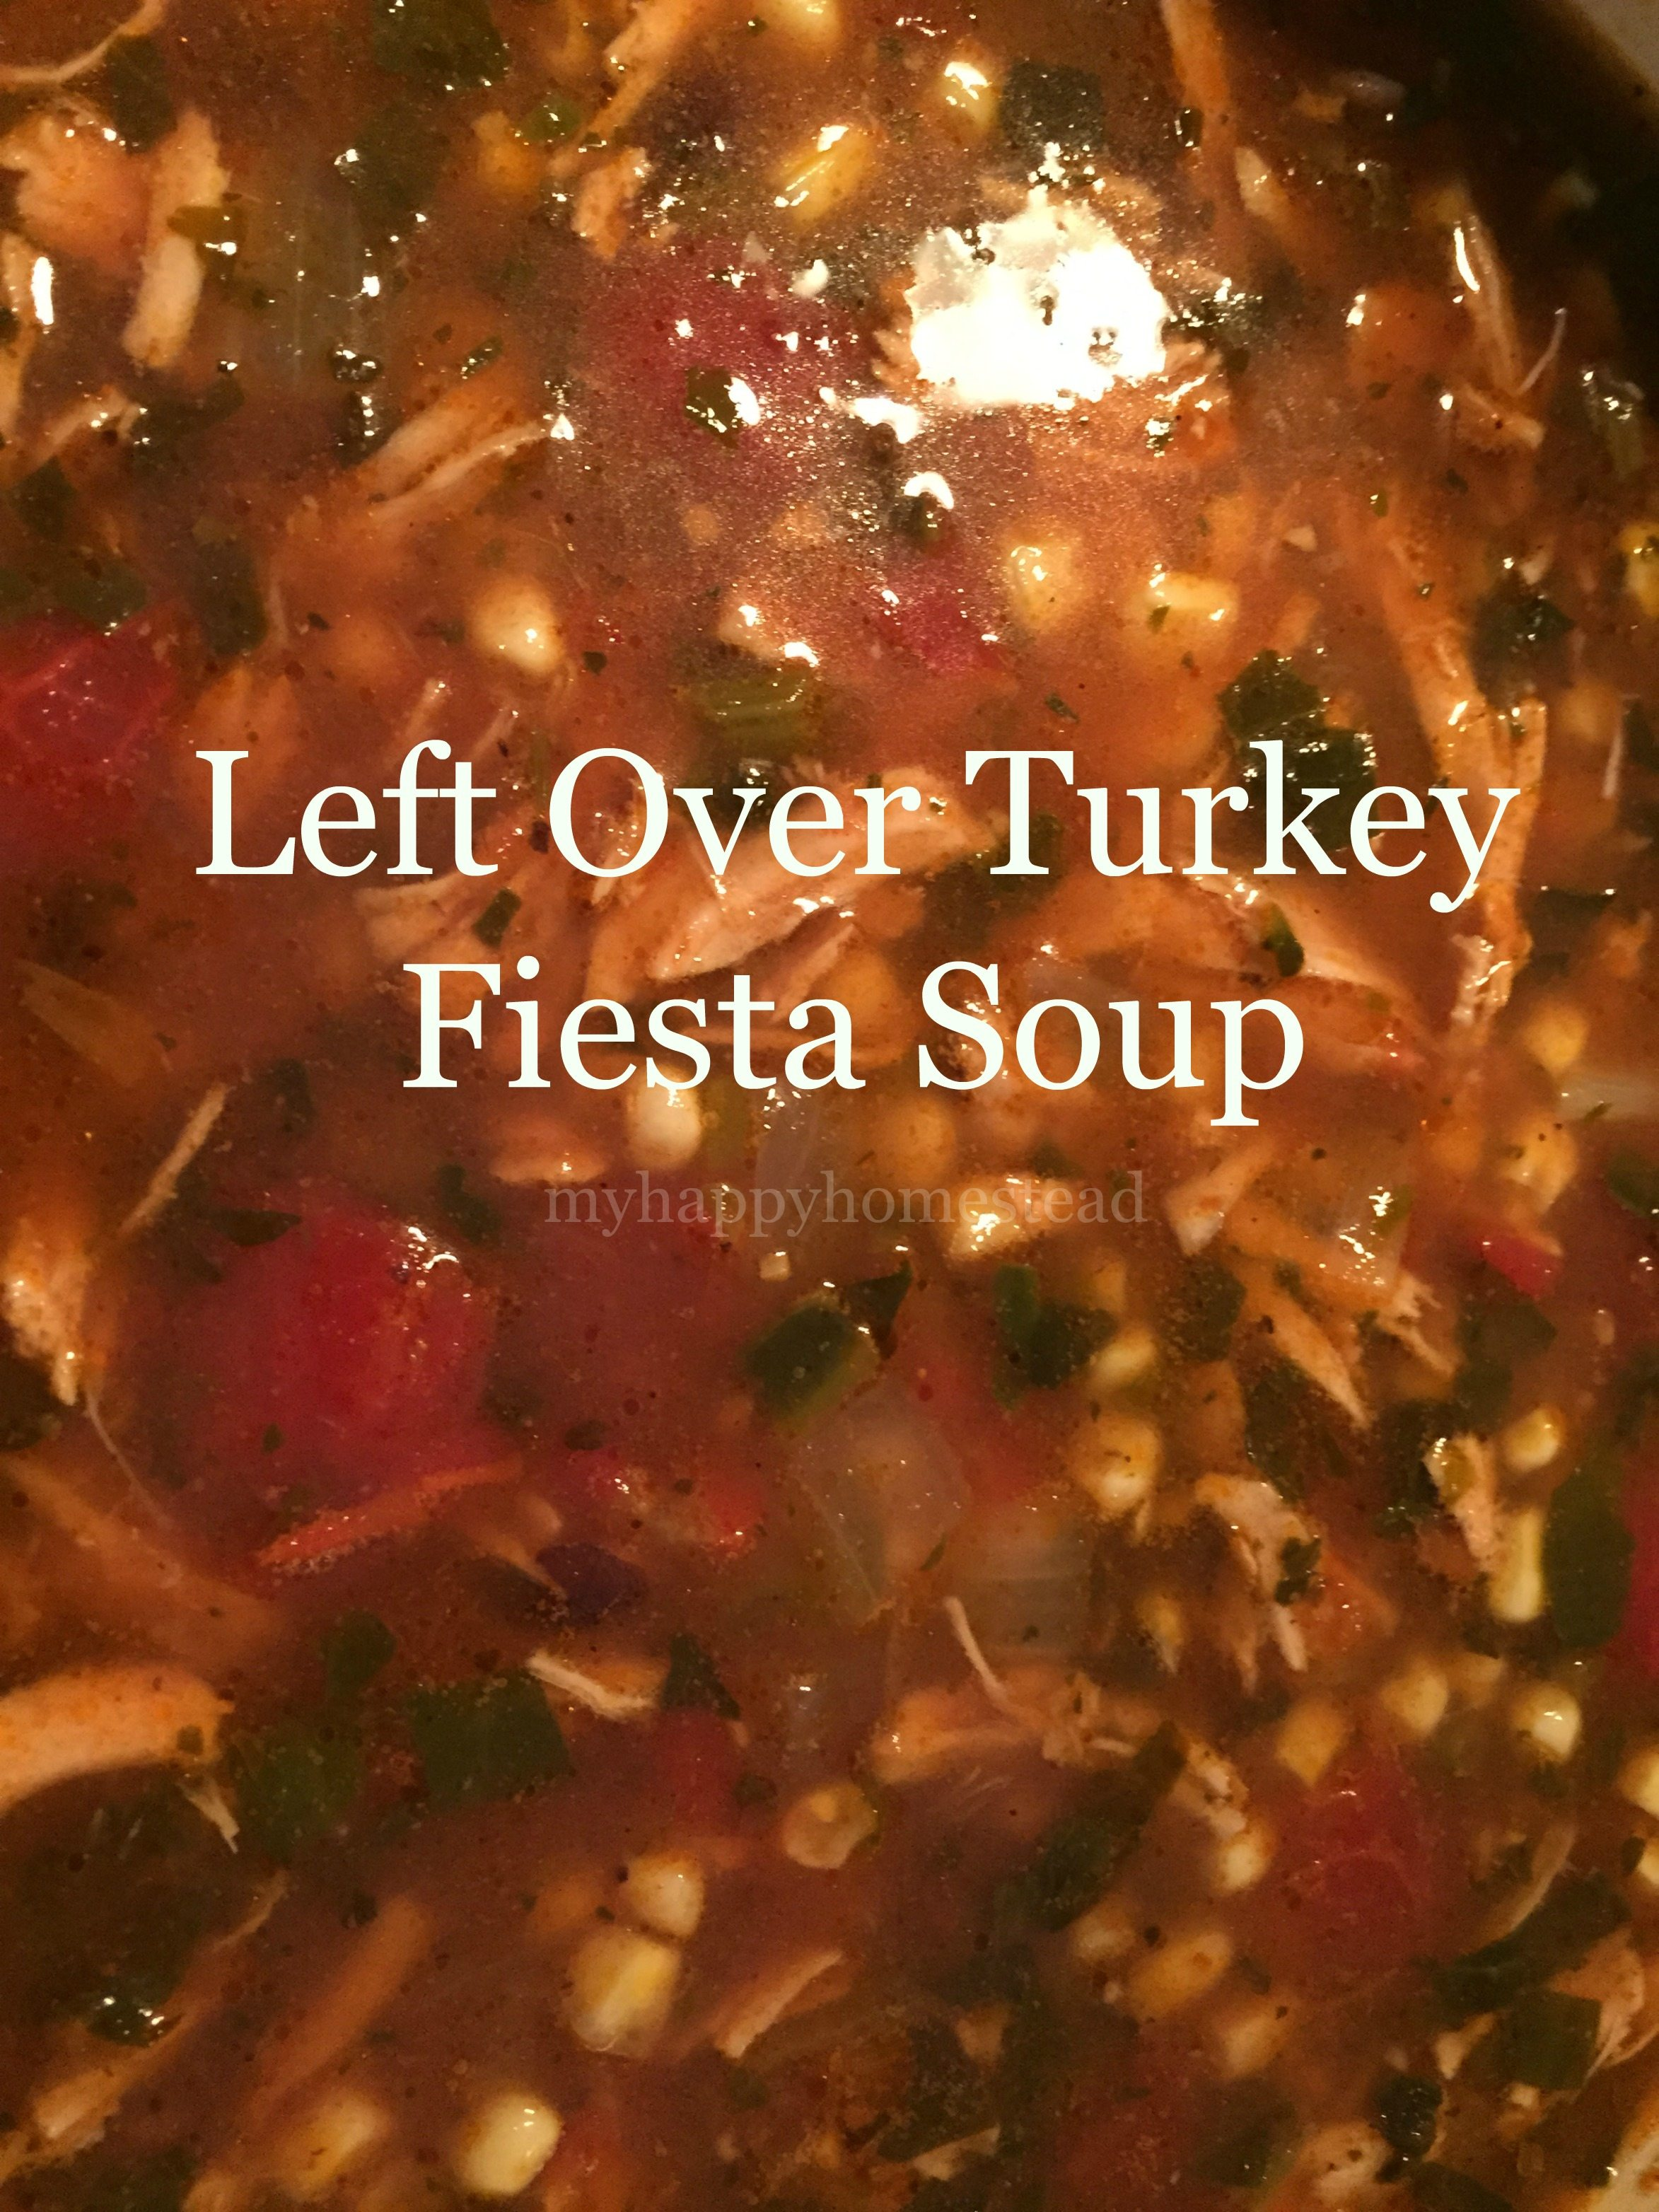 Left Over Turkey Fiesta Soup